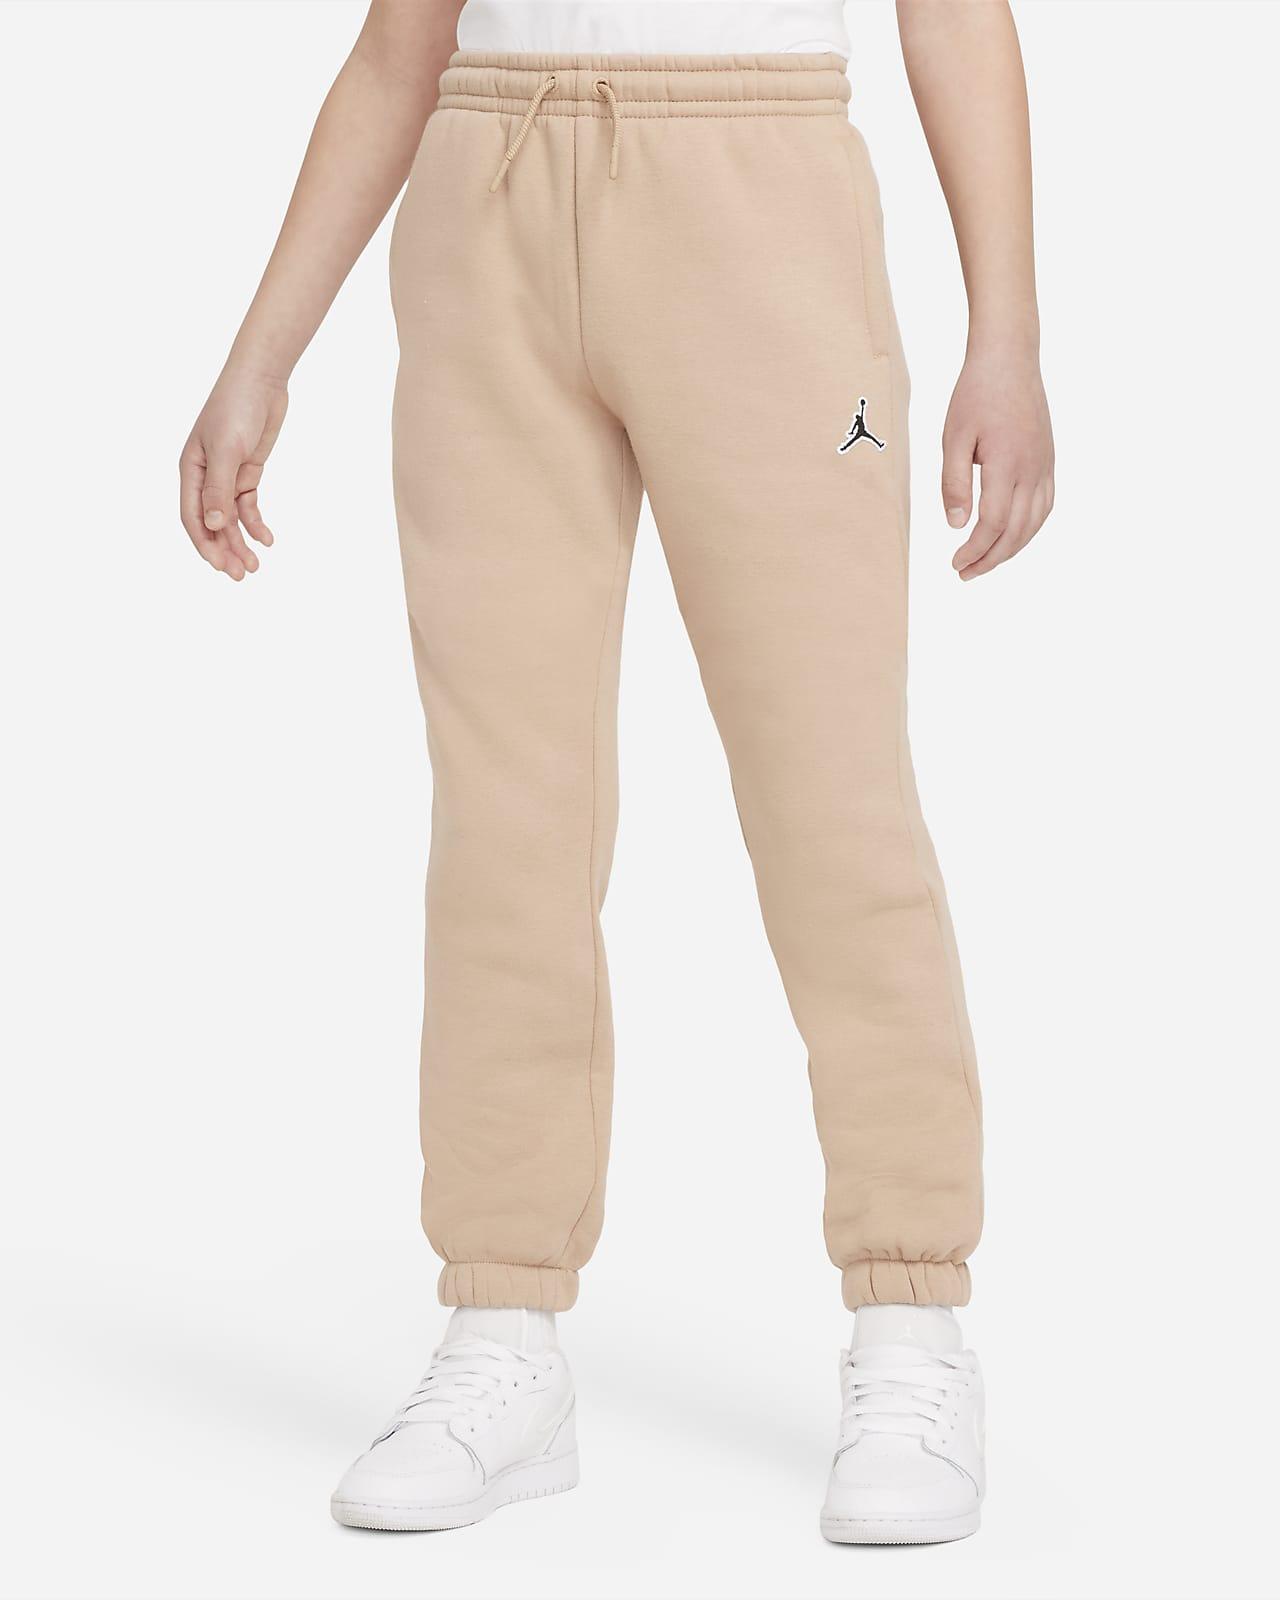 Calças Jordan Júnior (Rapaz)